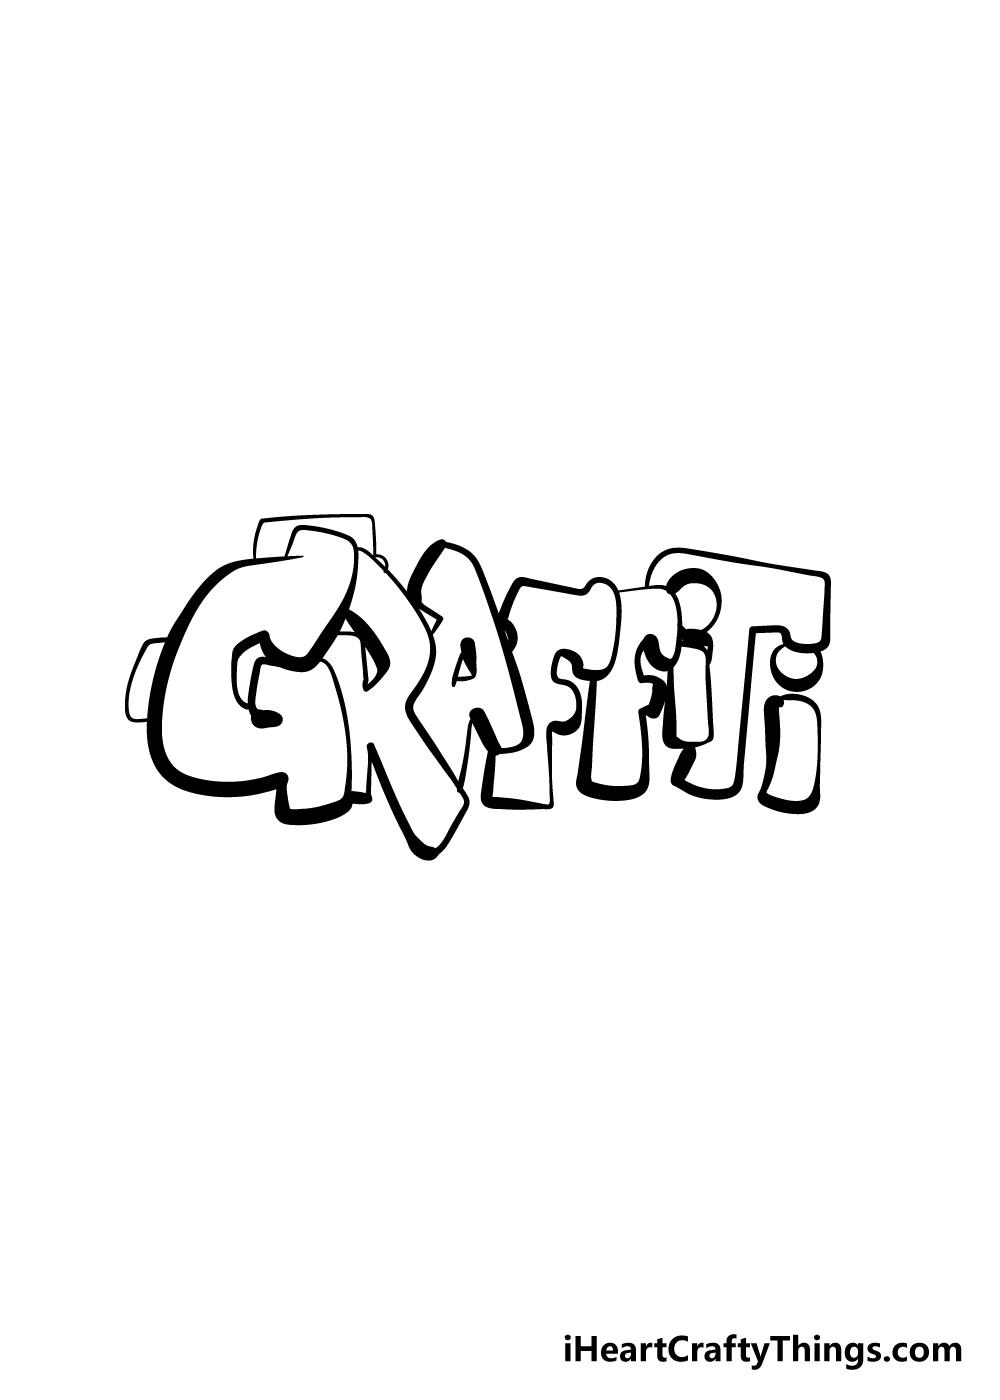 graffiti drawing step 8